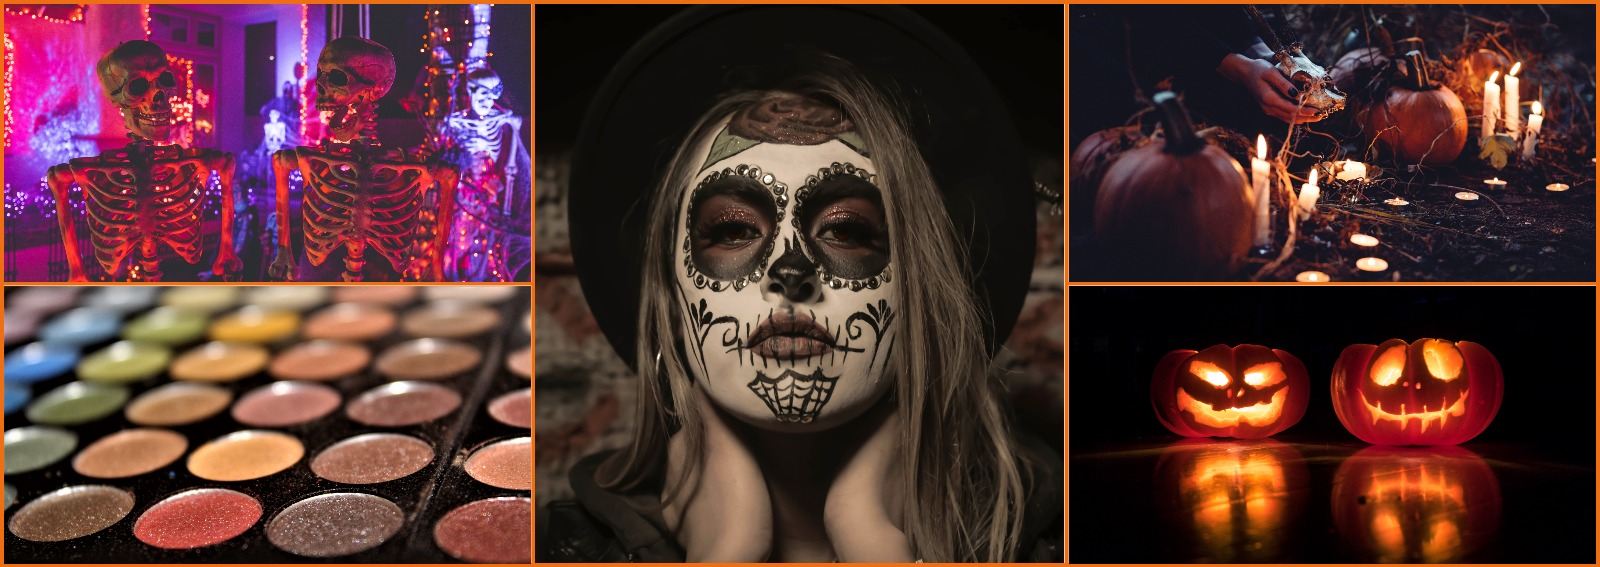 trucco halloween ragazza semplice spaventoso 2018 cover desktop